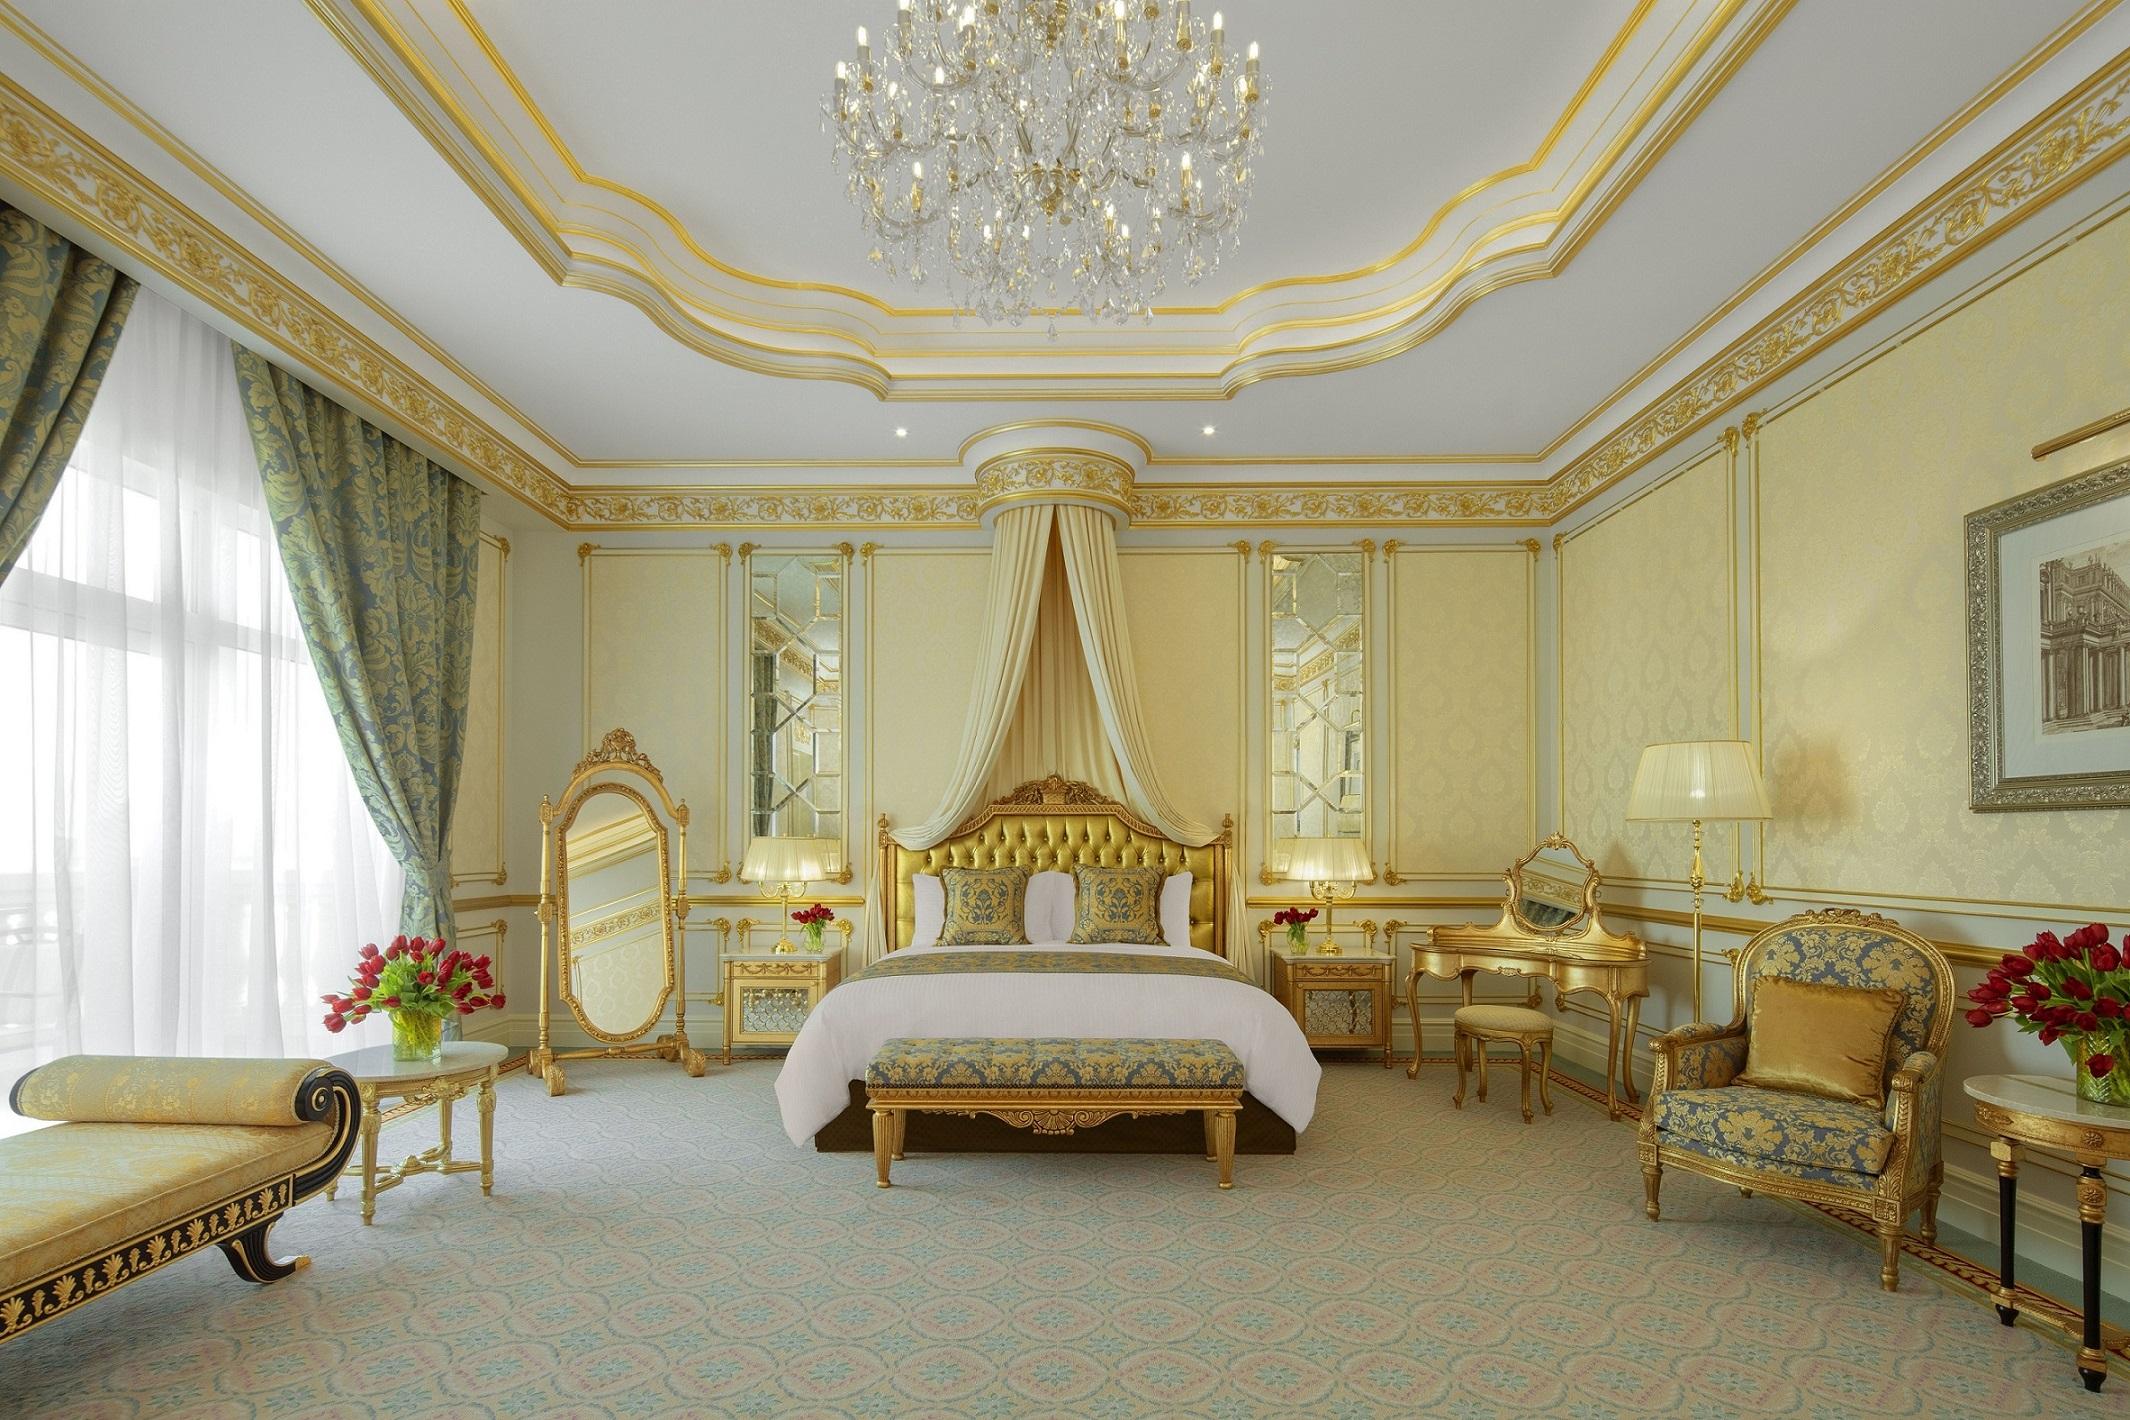 Raffles The Palm Dubai - Royal Suite - Master Bedroom